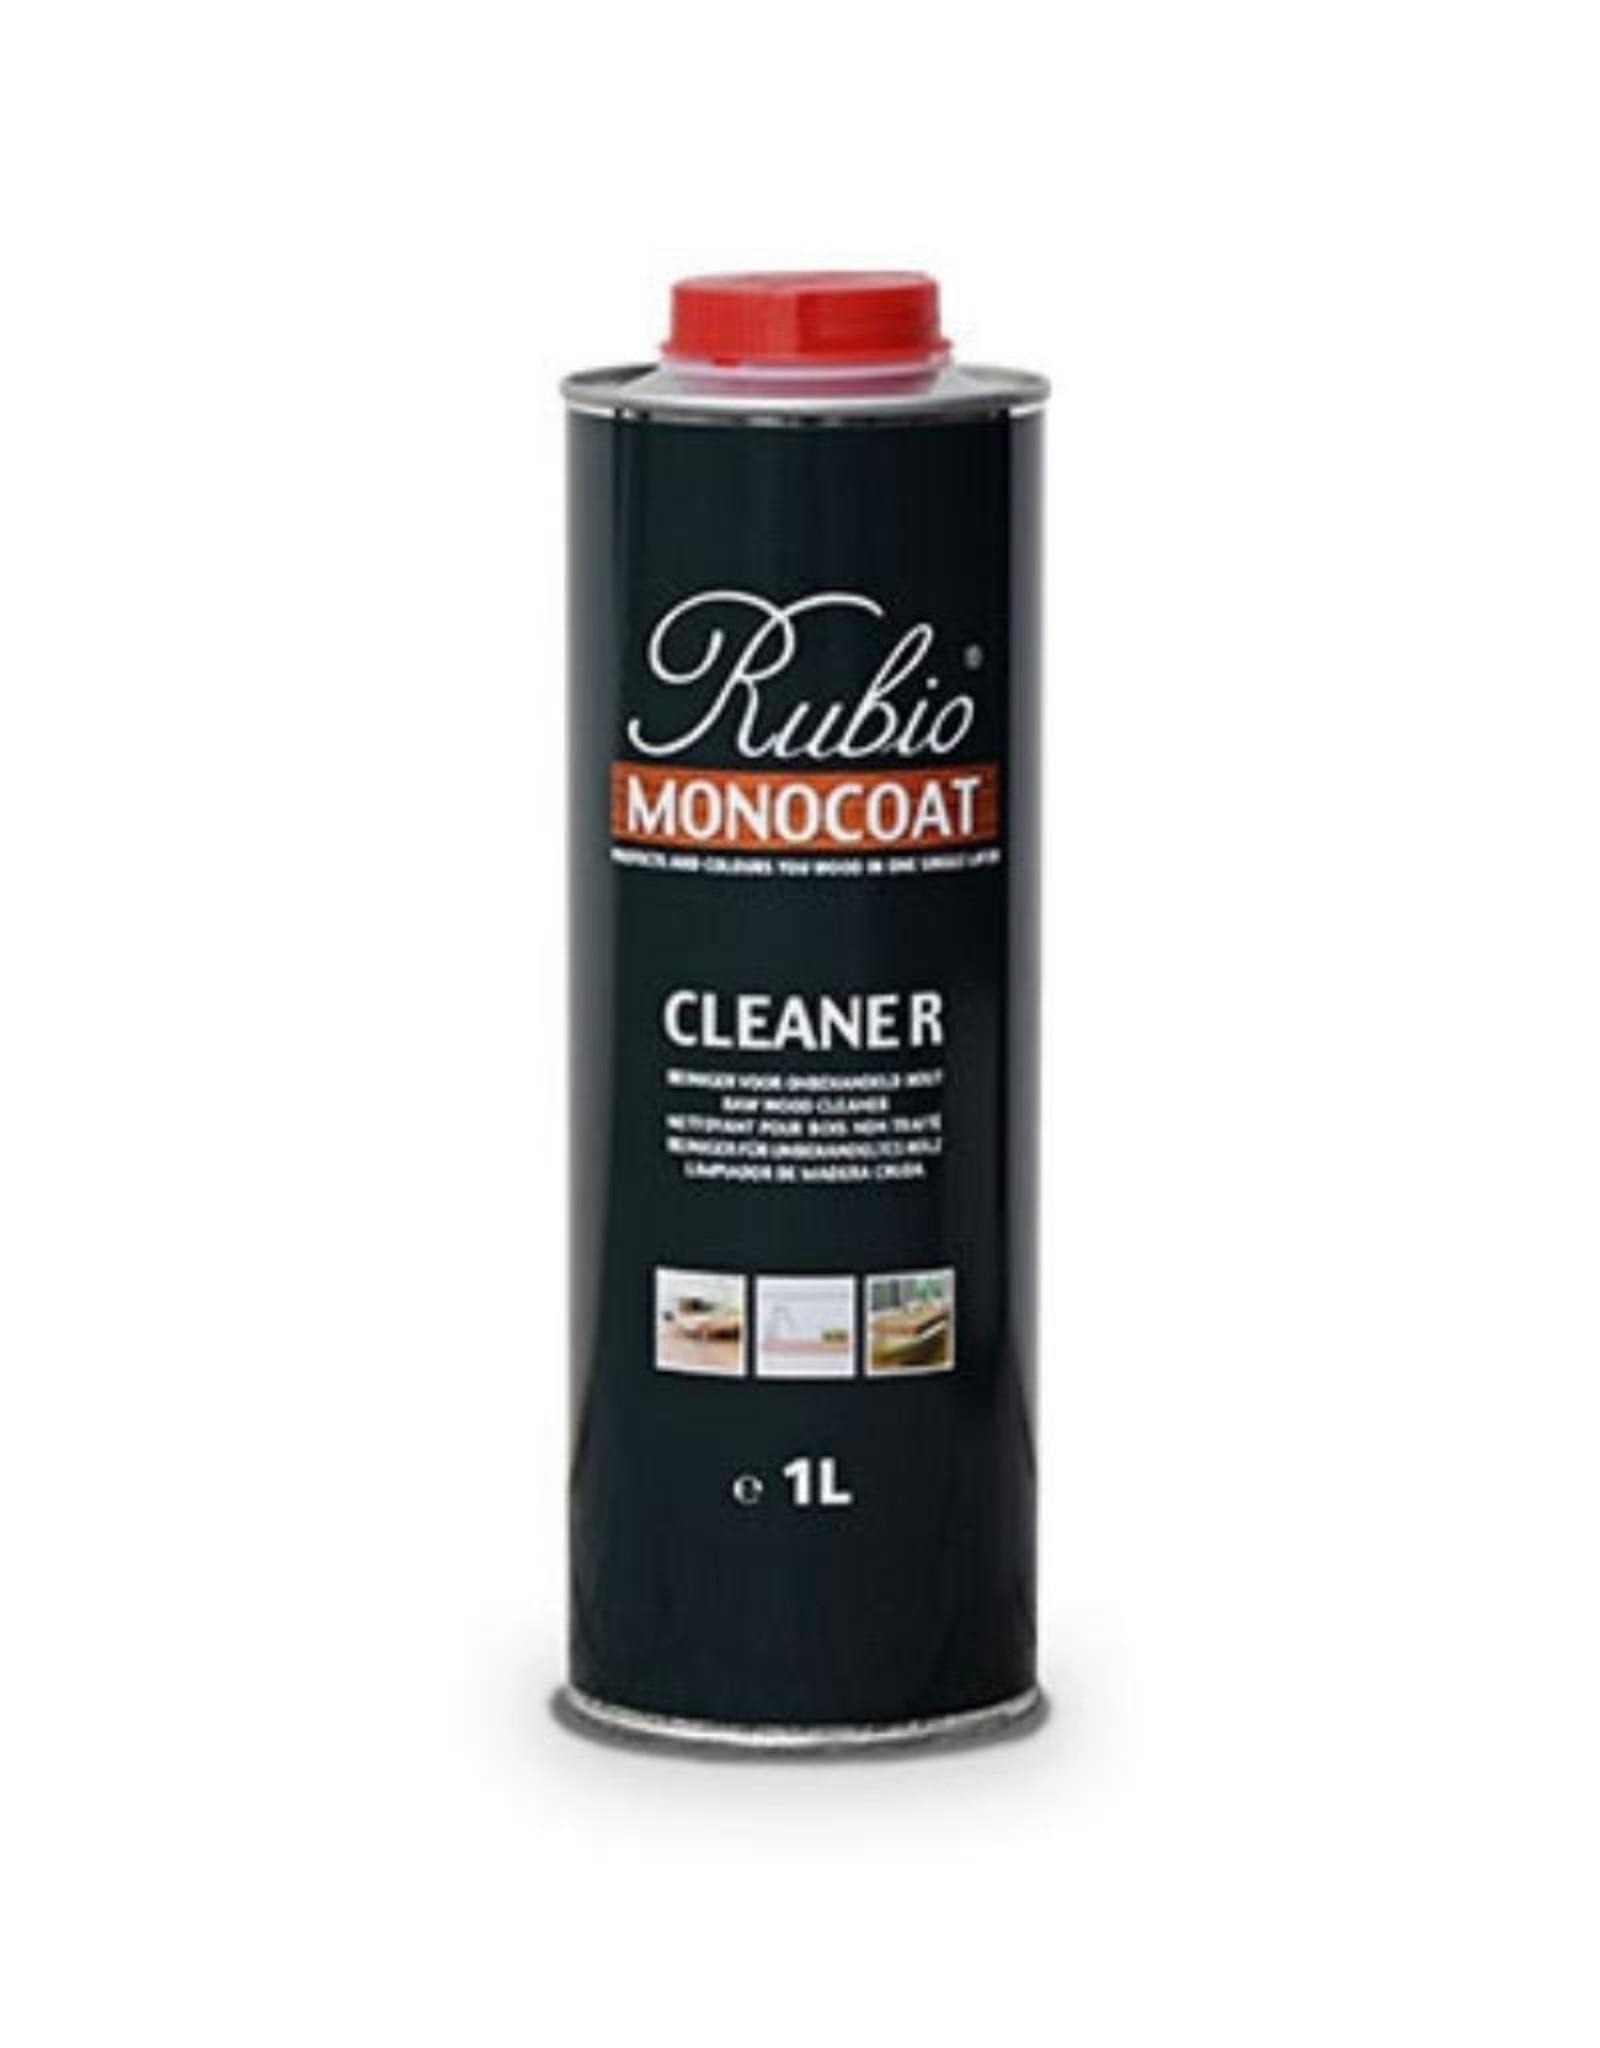 RUBIO MONOCOAT Raw Wood Cleaner